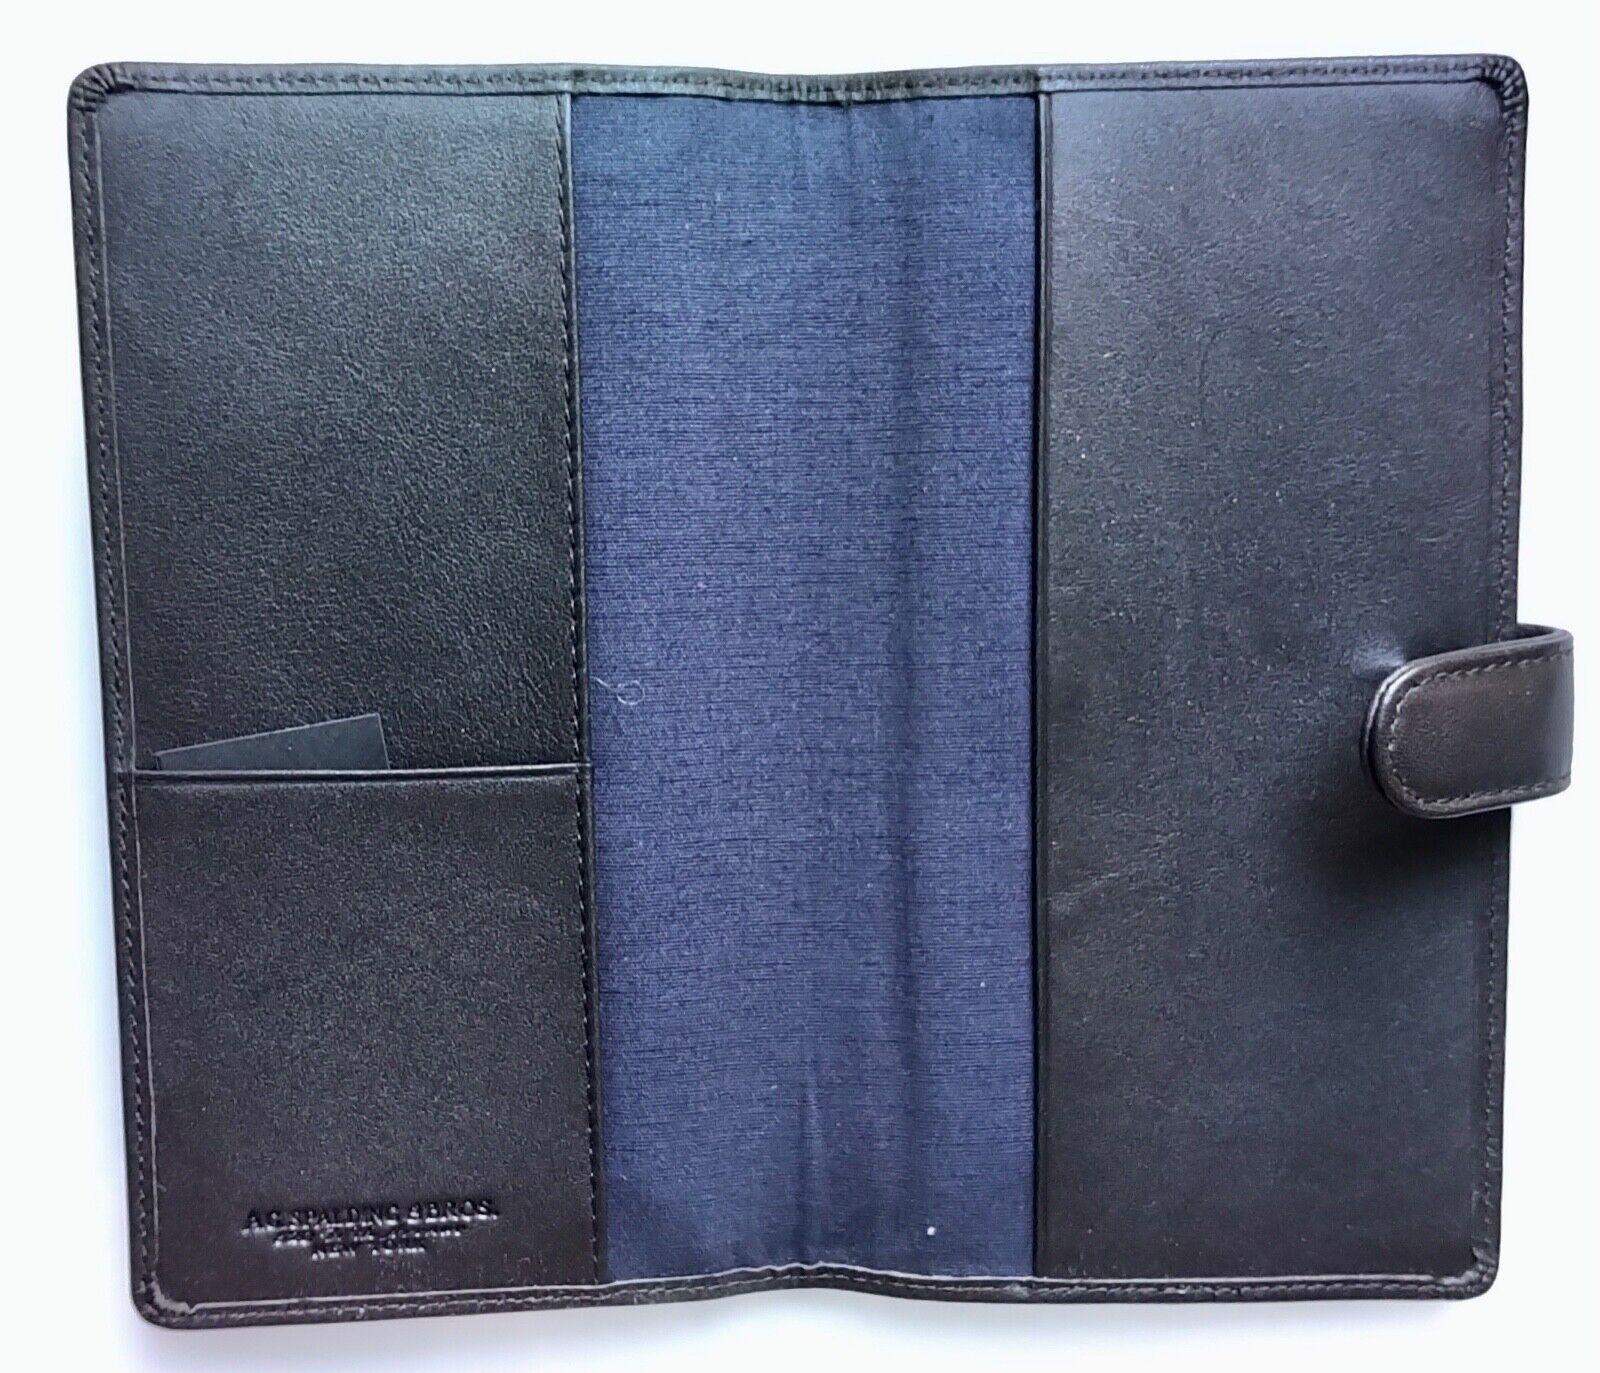 A.G SPALDING & Bros Calf Leather A5 Desk Agenda, Shiny